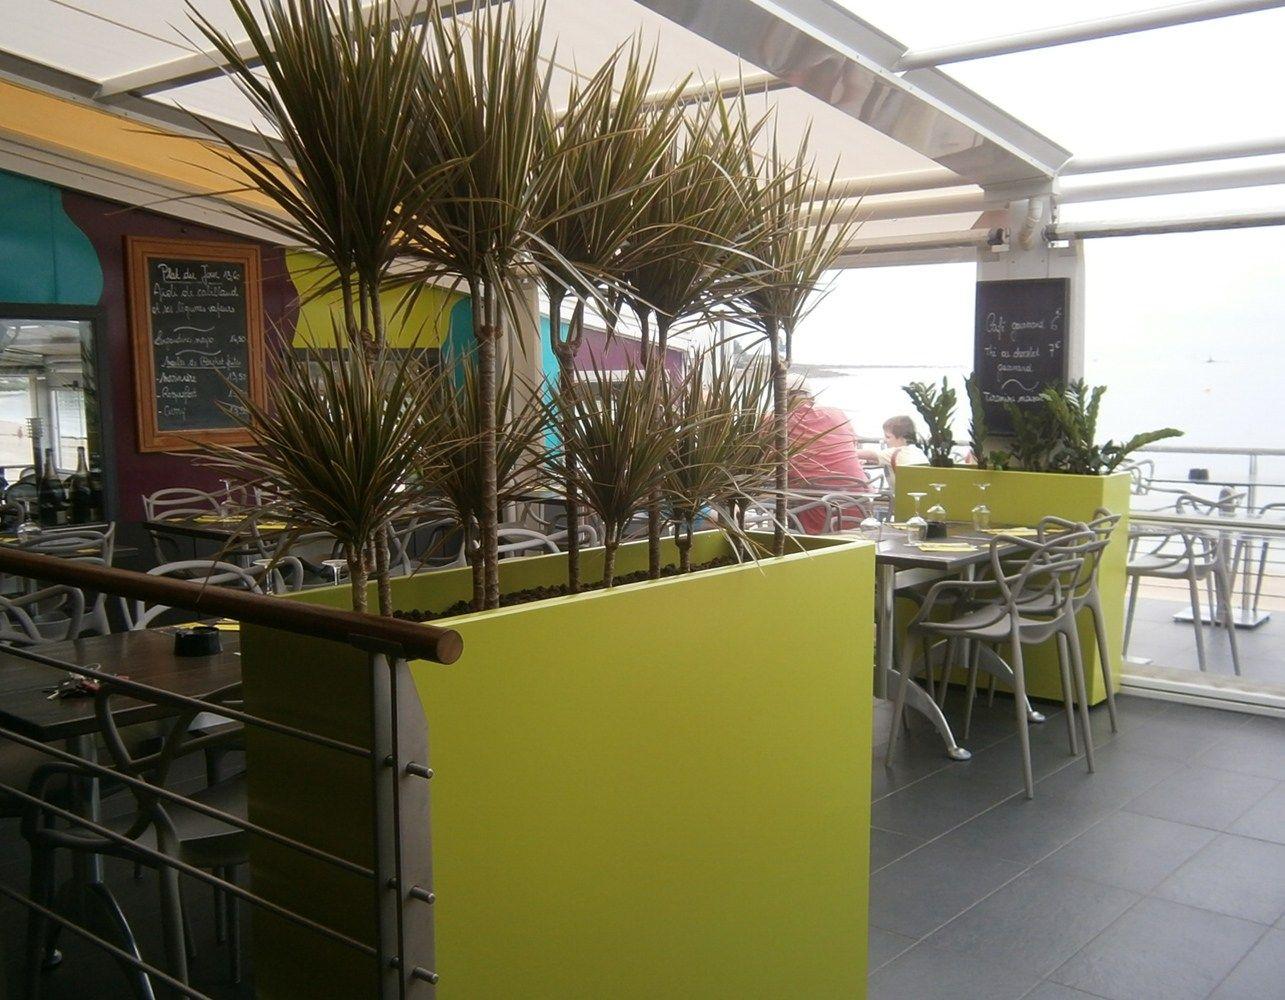 jardini re en fibre ciment bacs indoor sur roulettes by image 39 in by atelier so green design. Black Bedroom Furniture Sets. Home Design Ideas